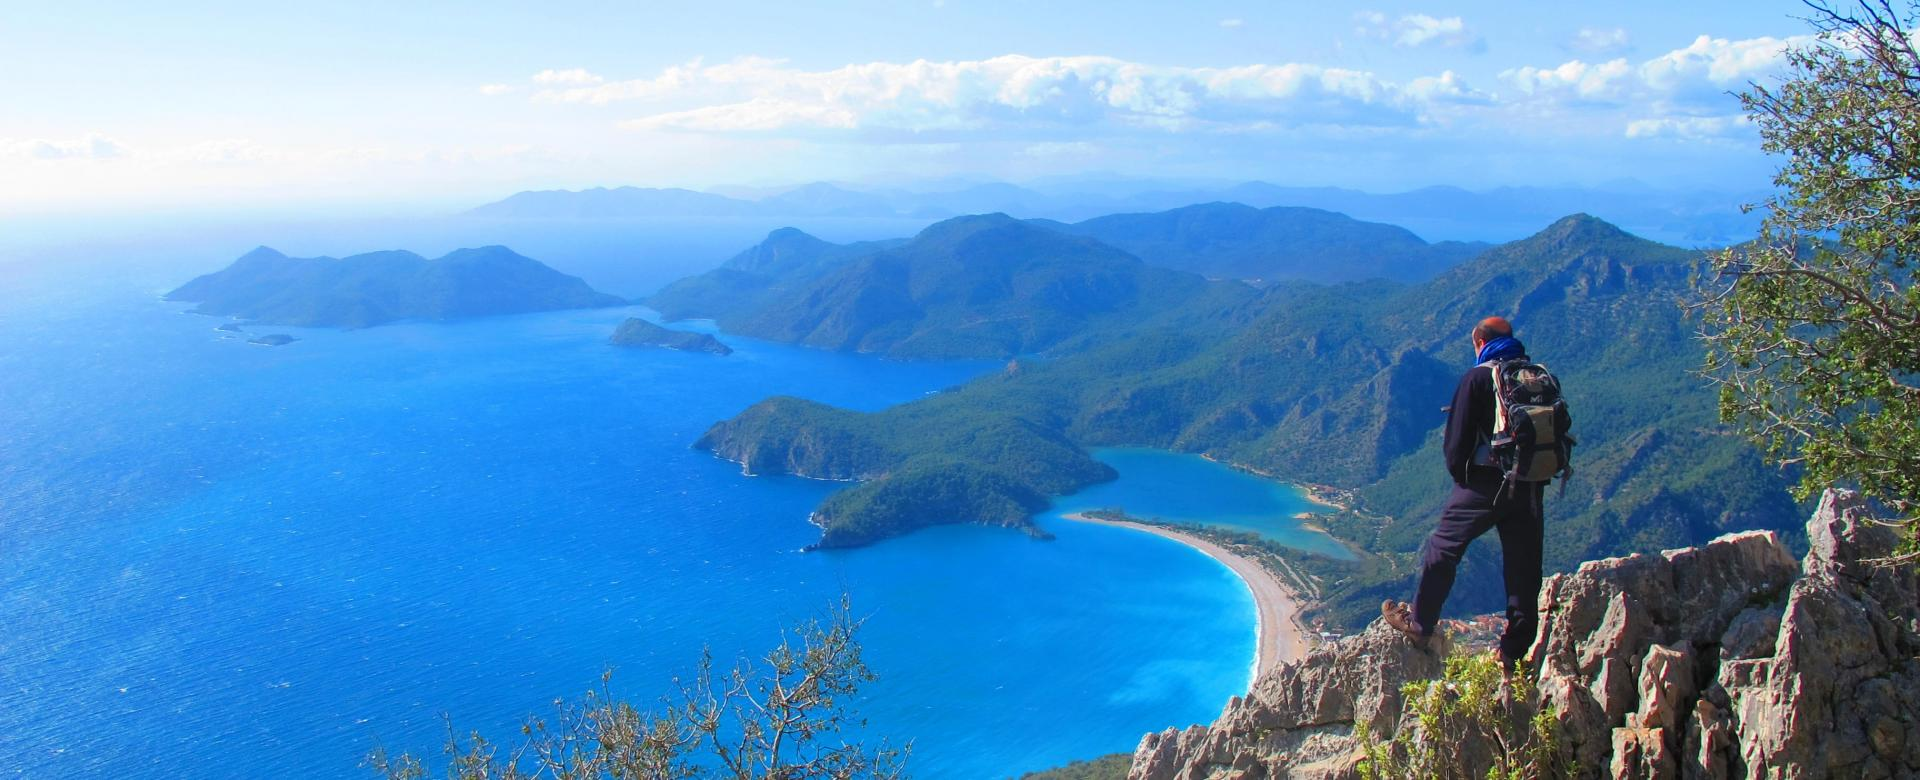 Voyage à pied Turquie : Lycian way